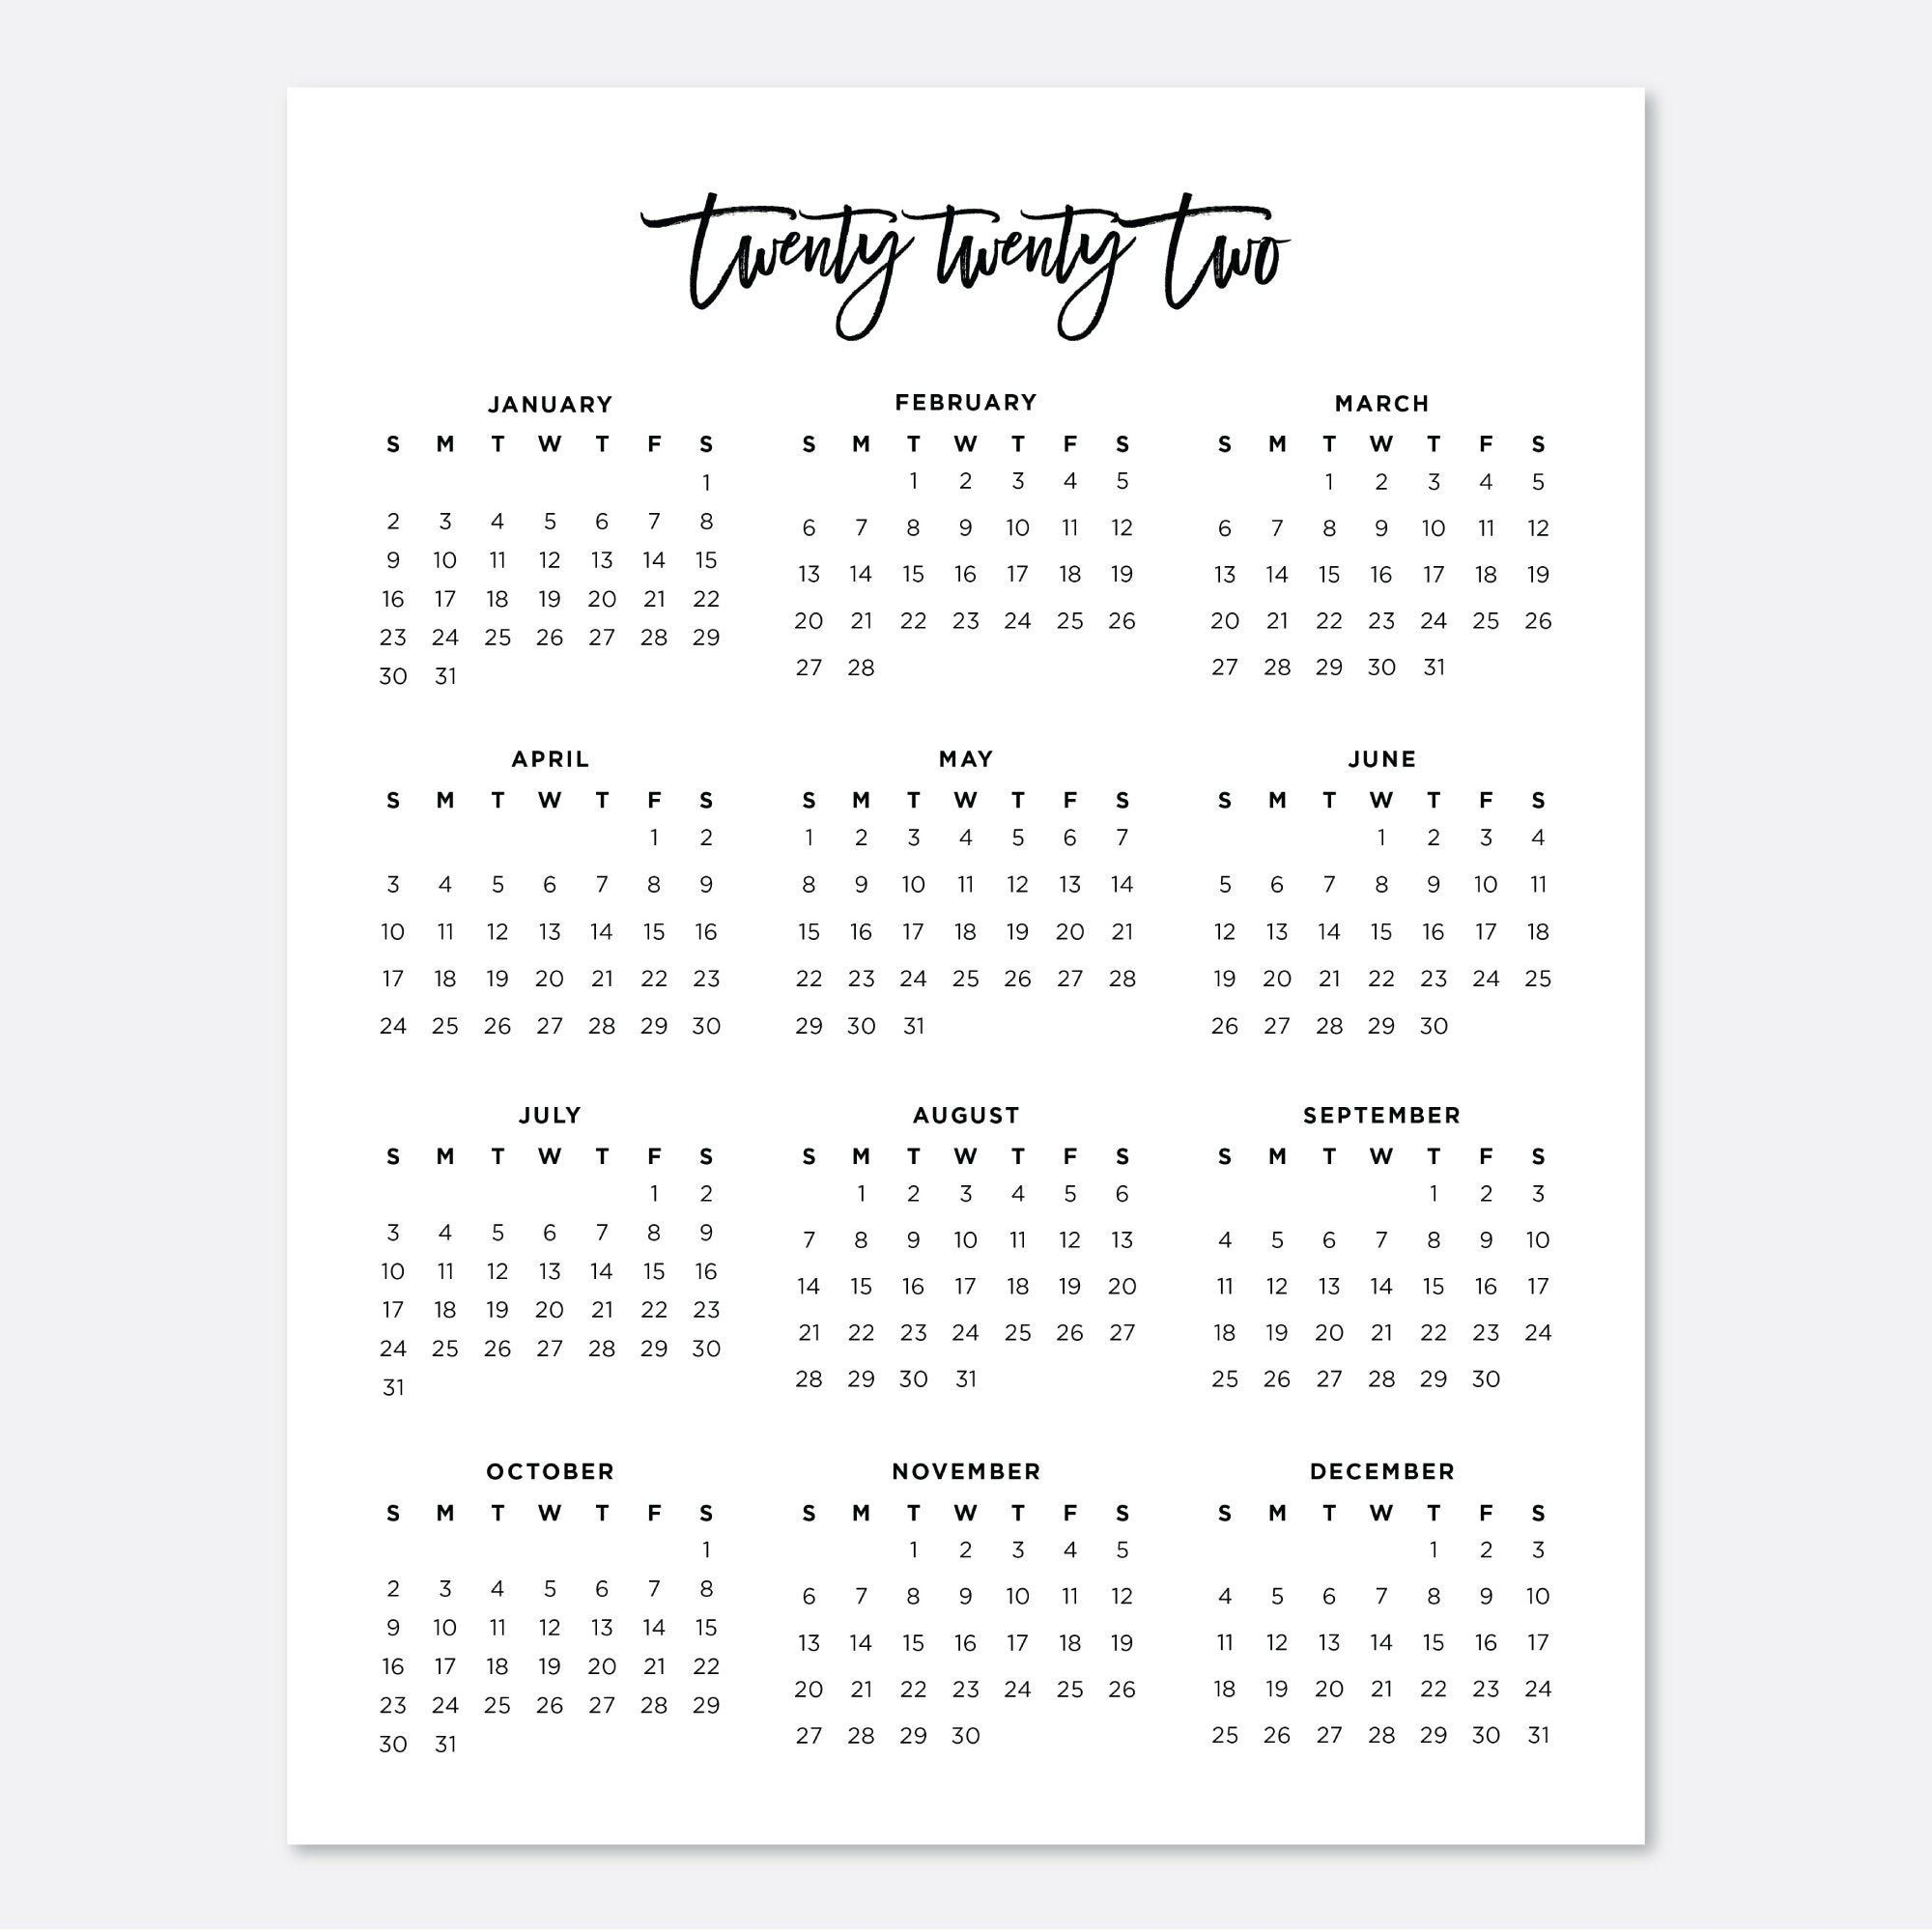 Cute 2022 Calendar.2022 Printable Calendar Digital Download Calendar Planner 2022 8 5x11